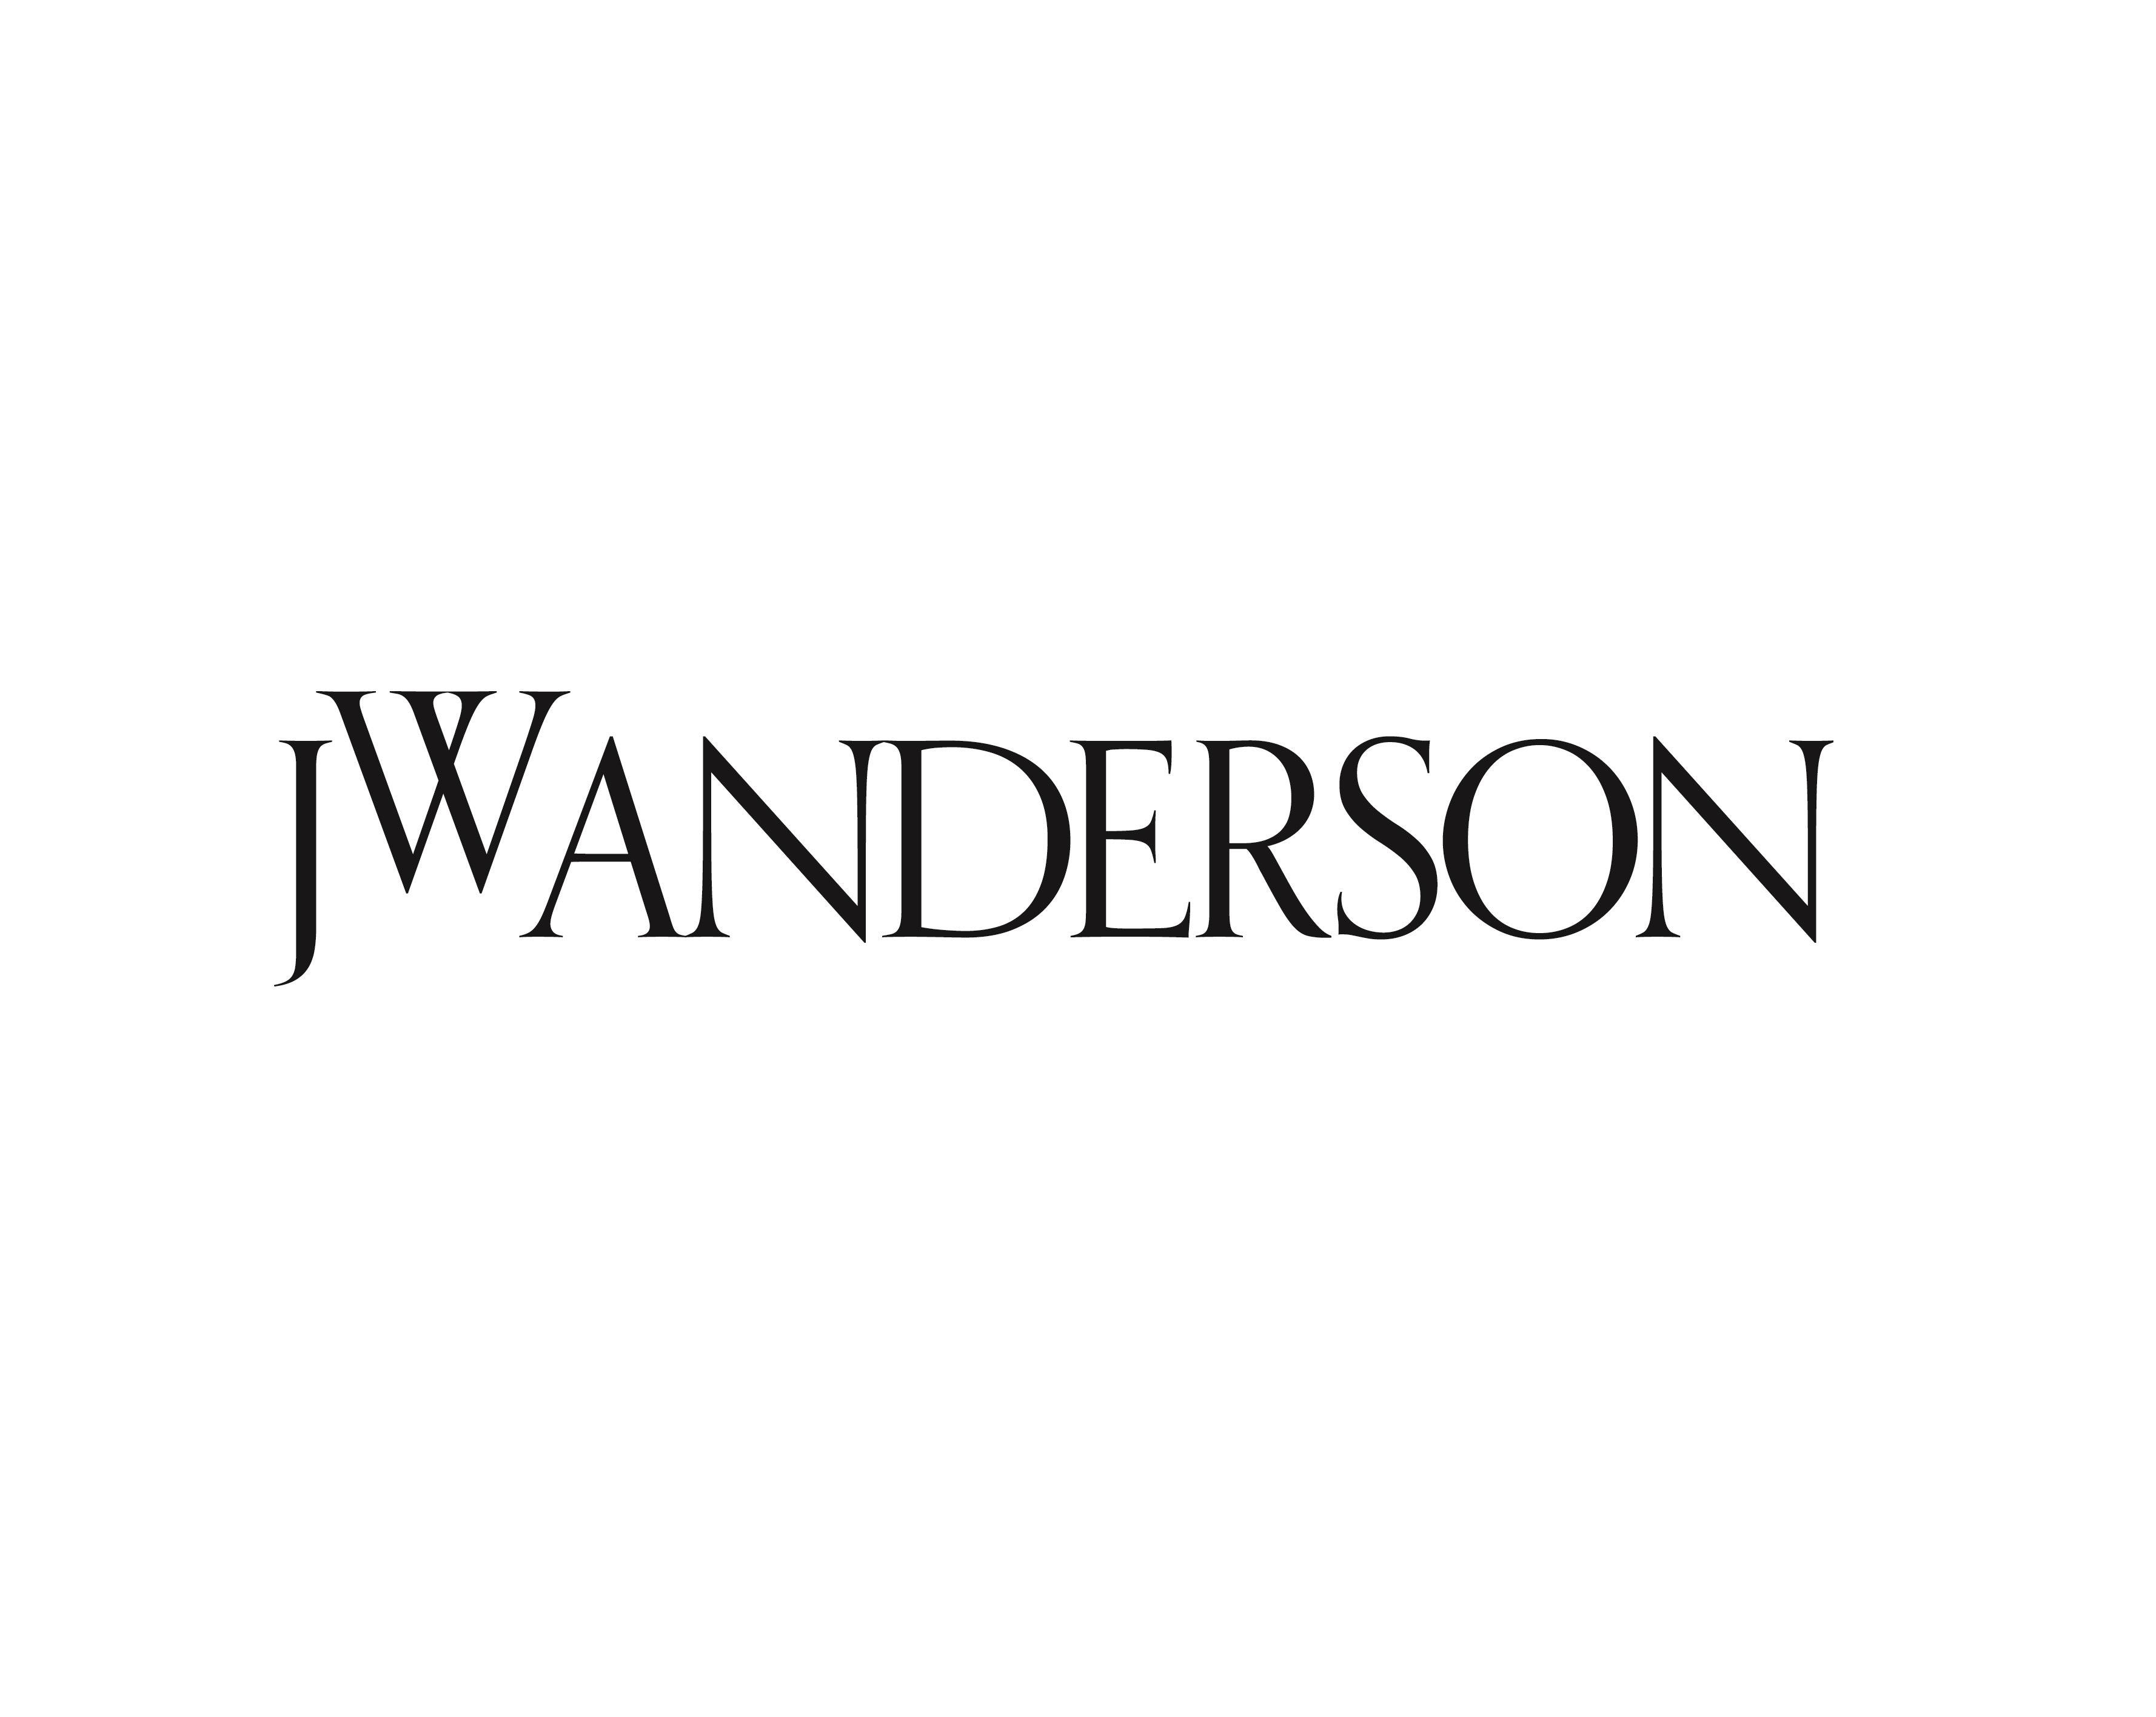 JW Anderson company logo